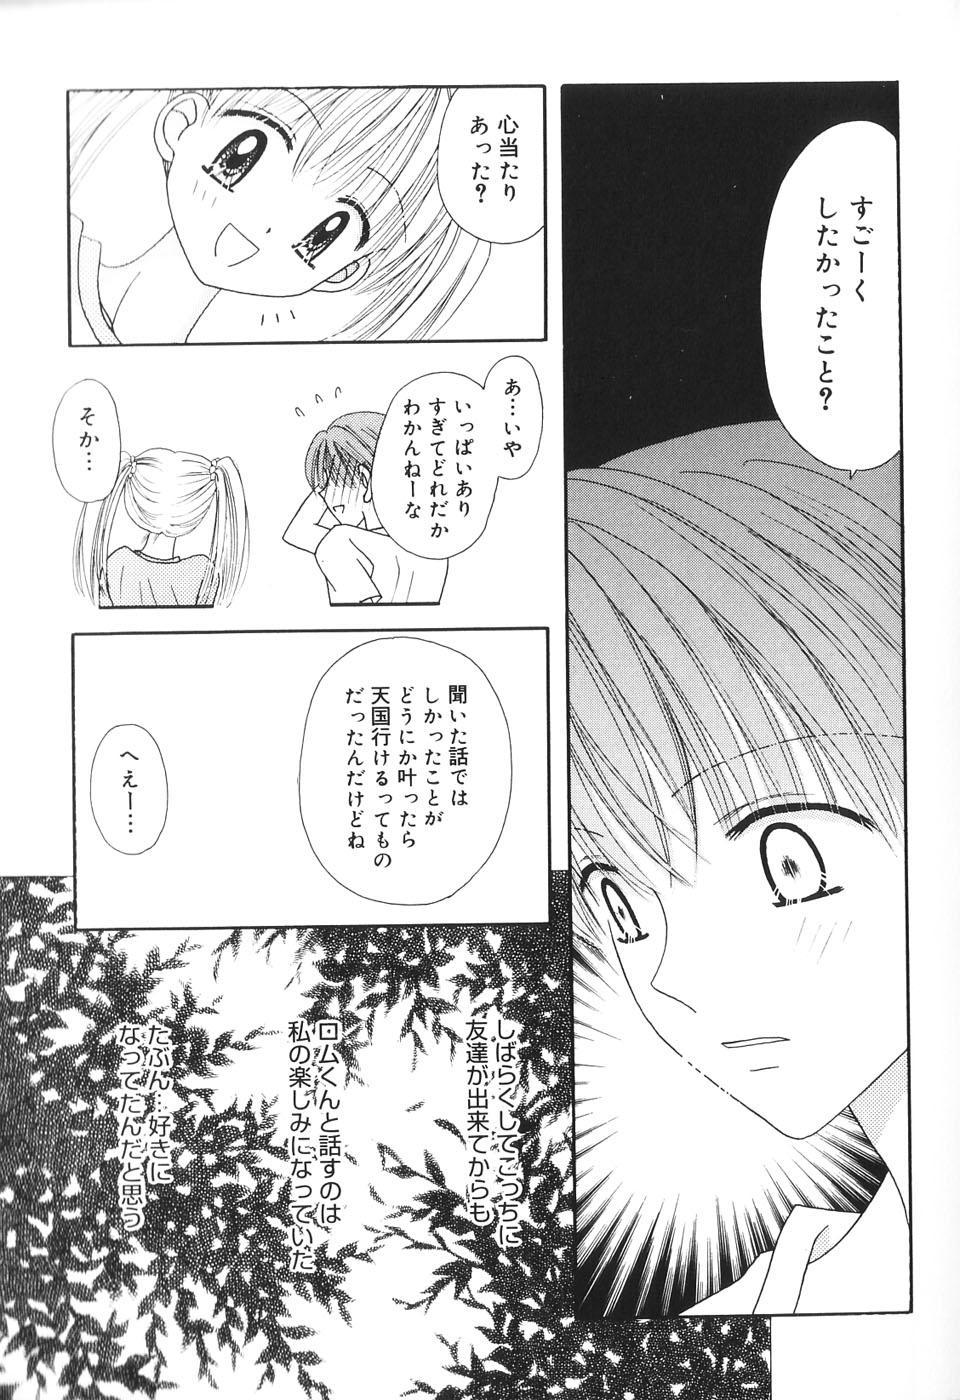 Musoubana 61